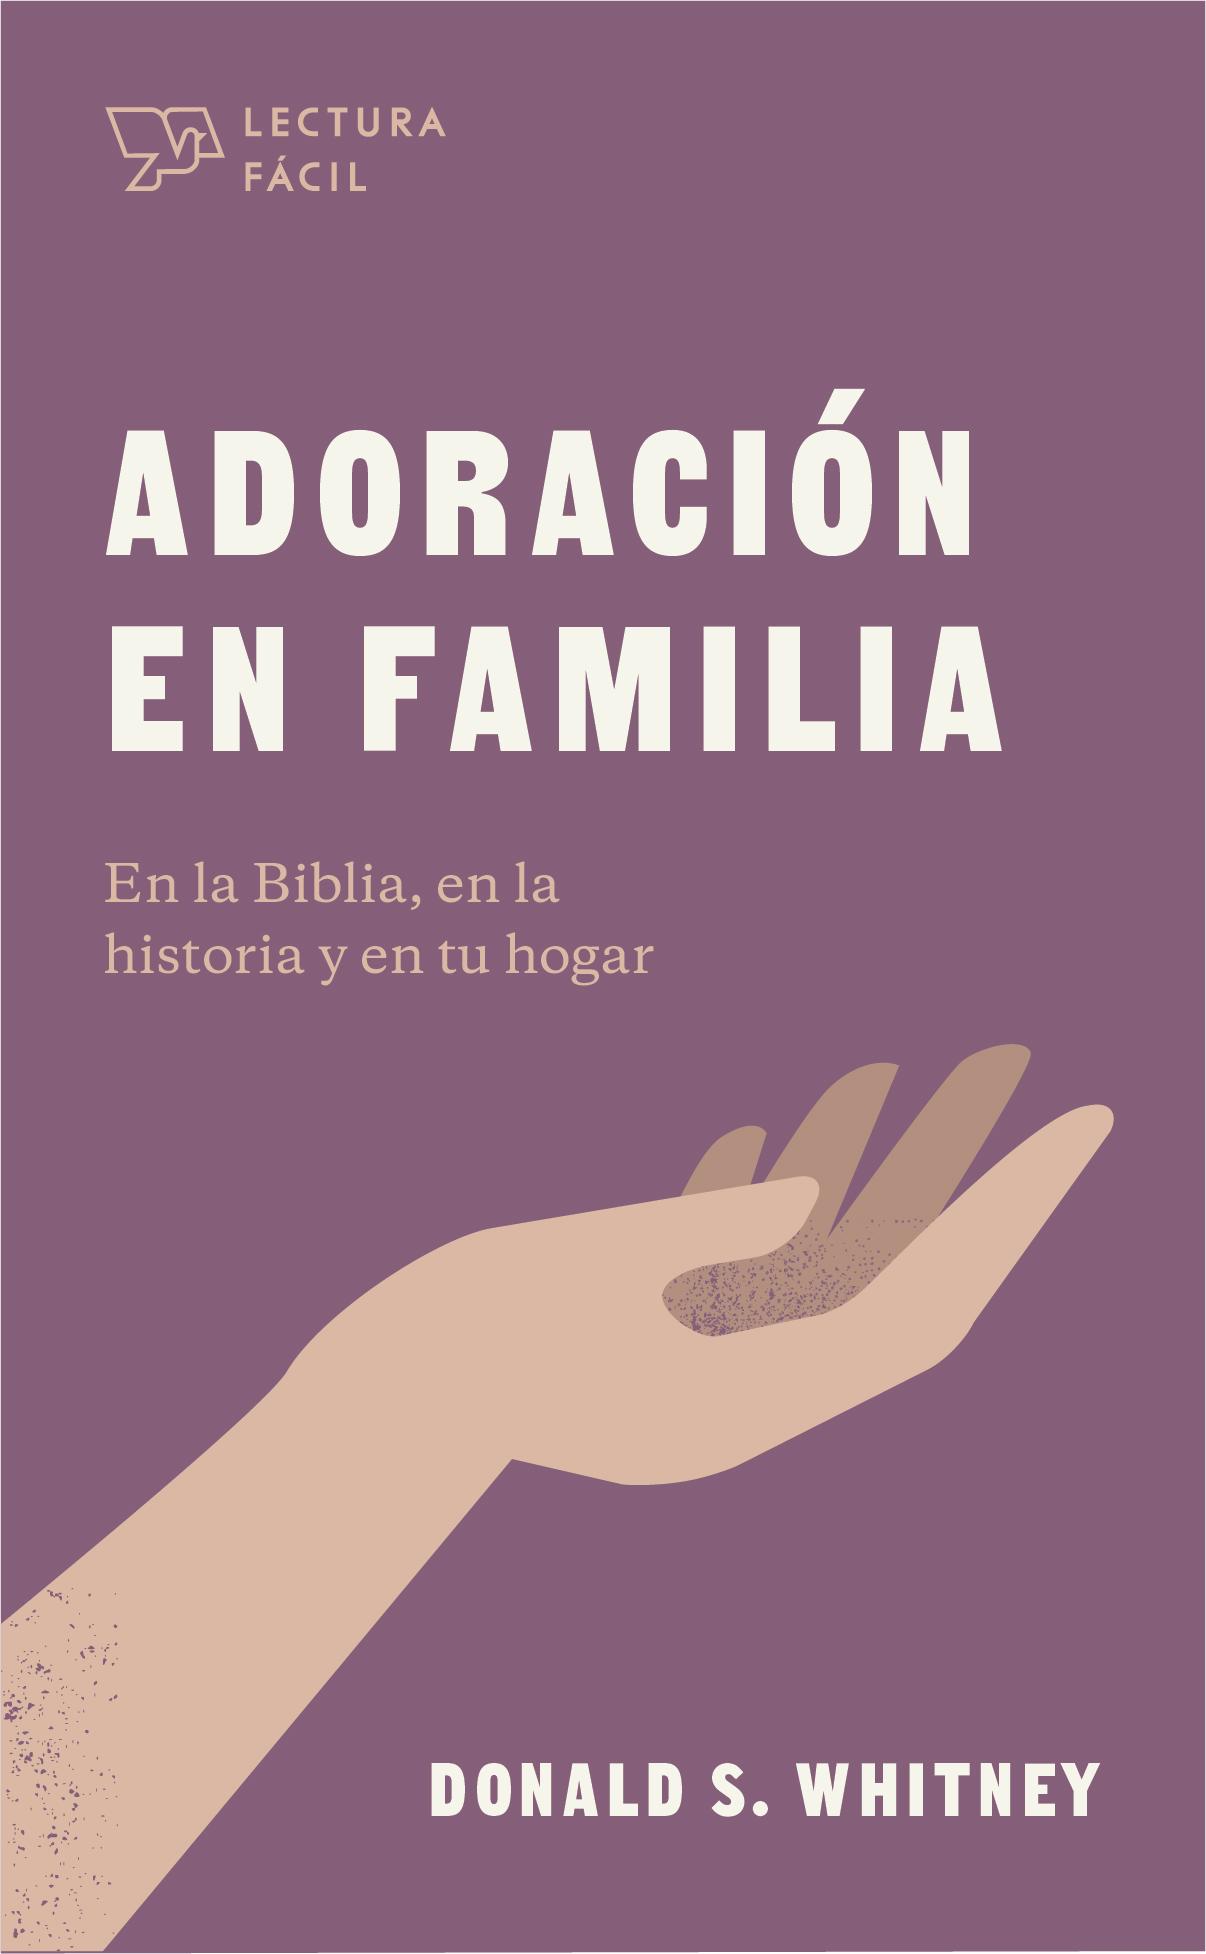 Adoración en Familia/Lectura Fácil